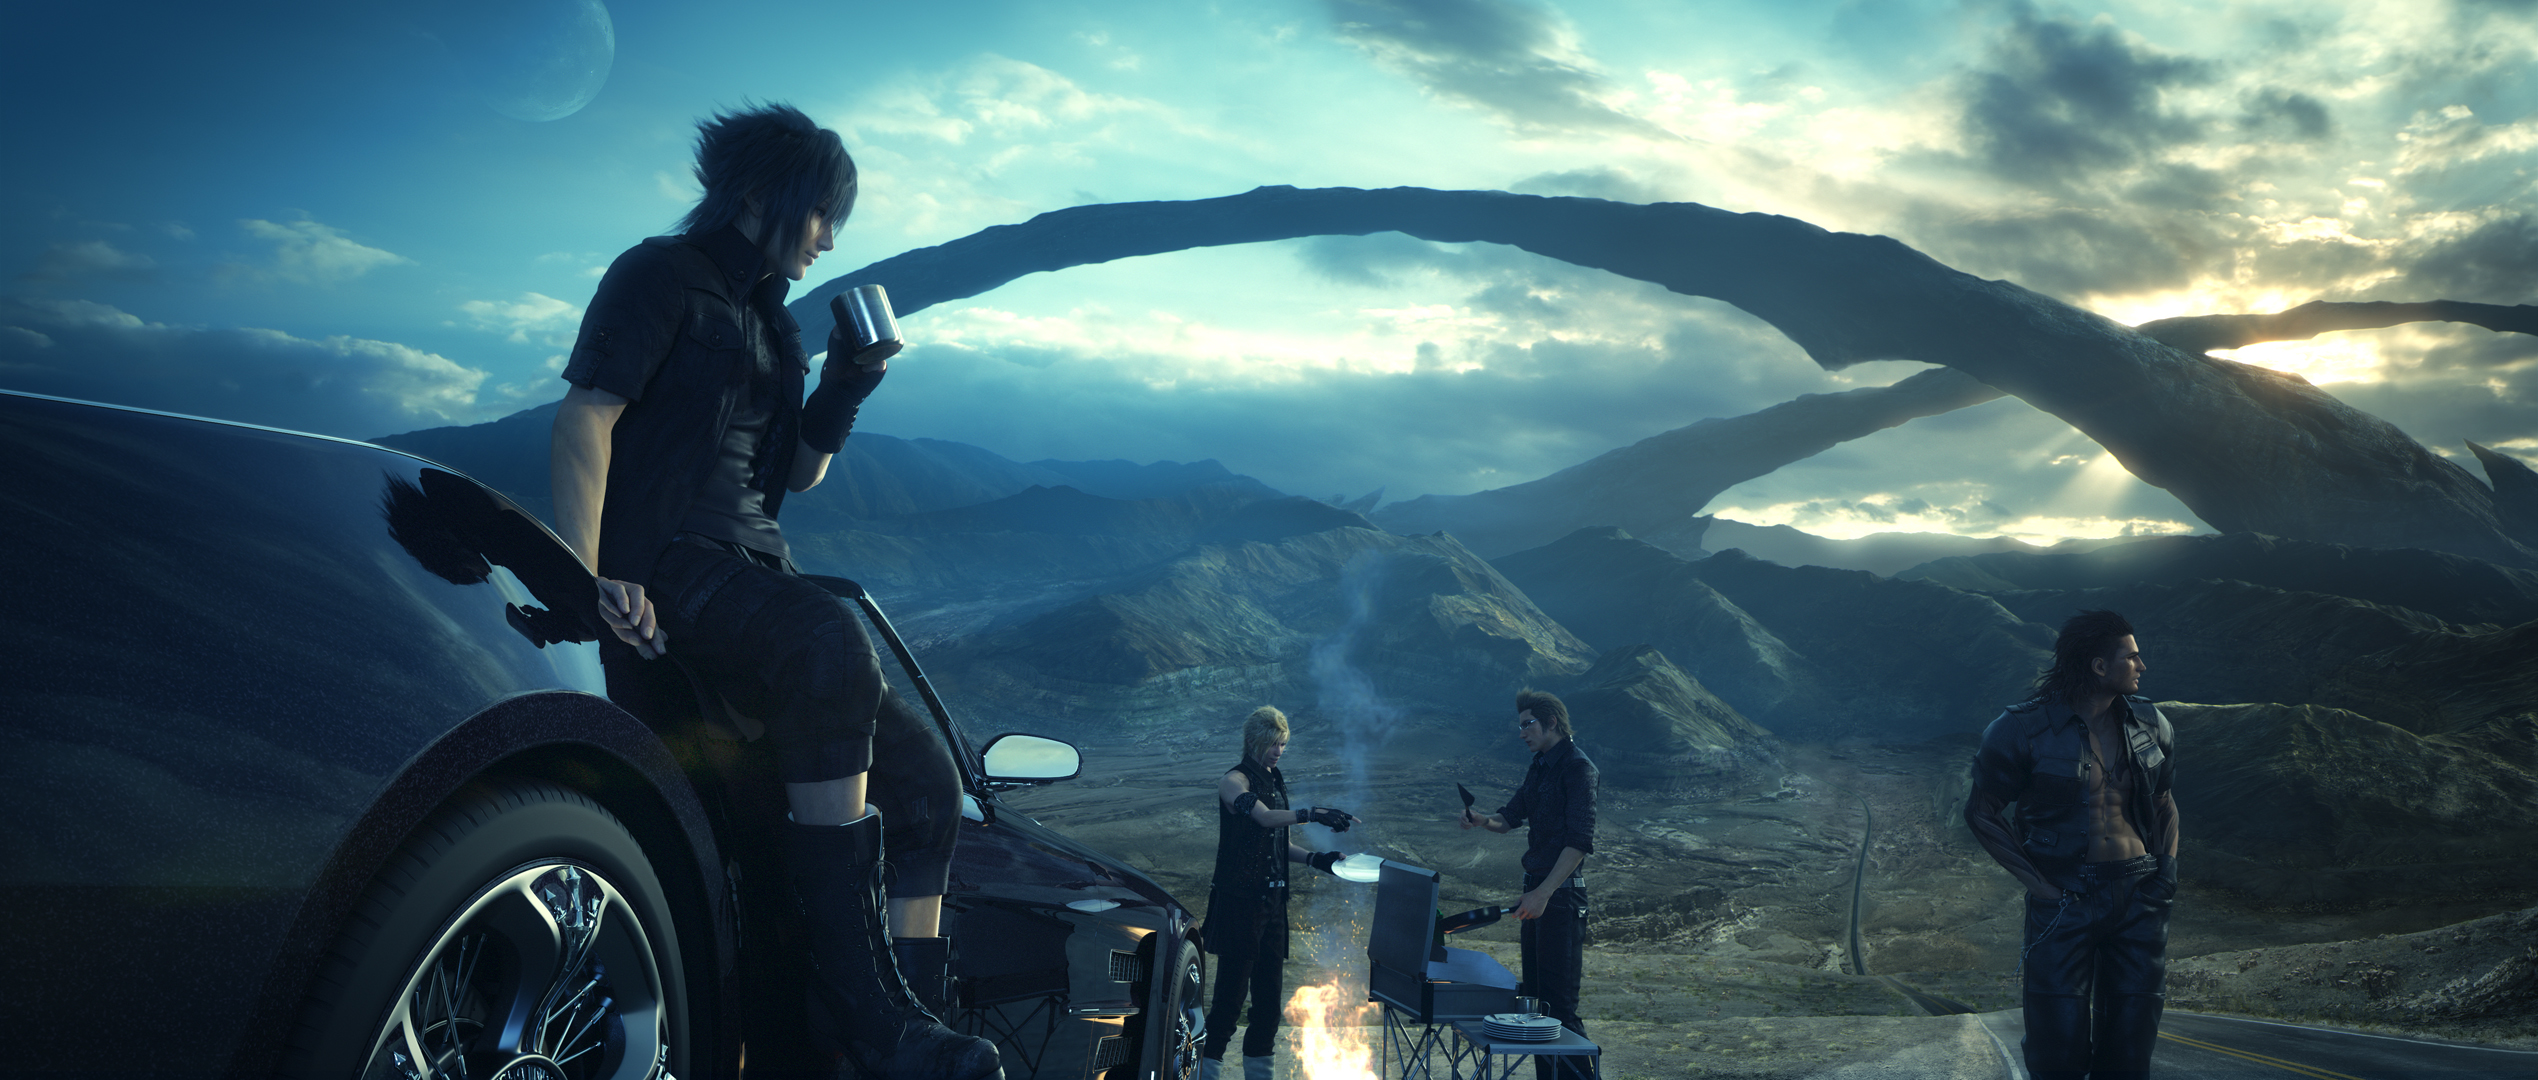 Final Fantasy Final Fantasy Xv Sunset 2560x1600